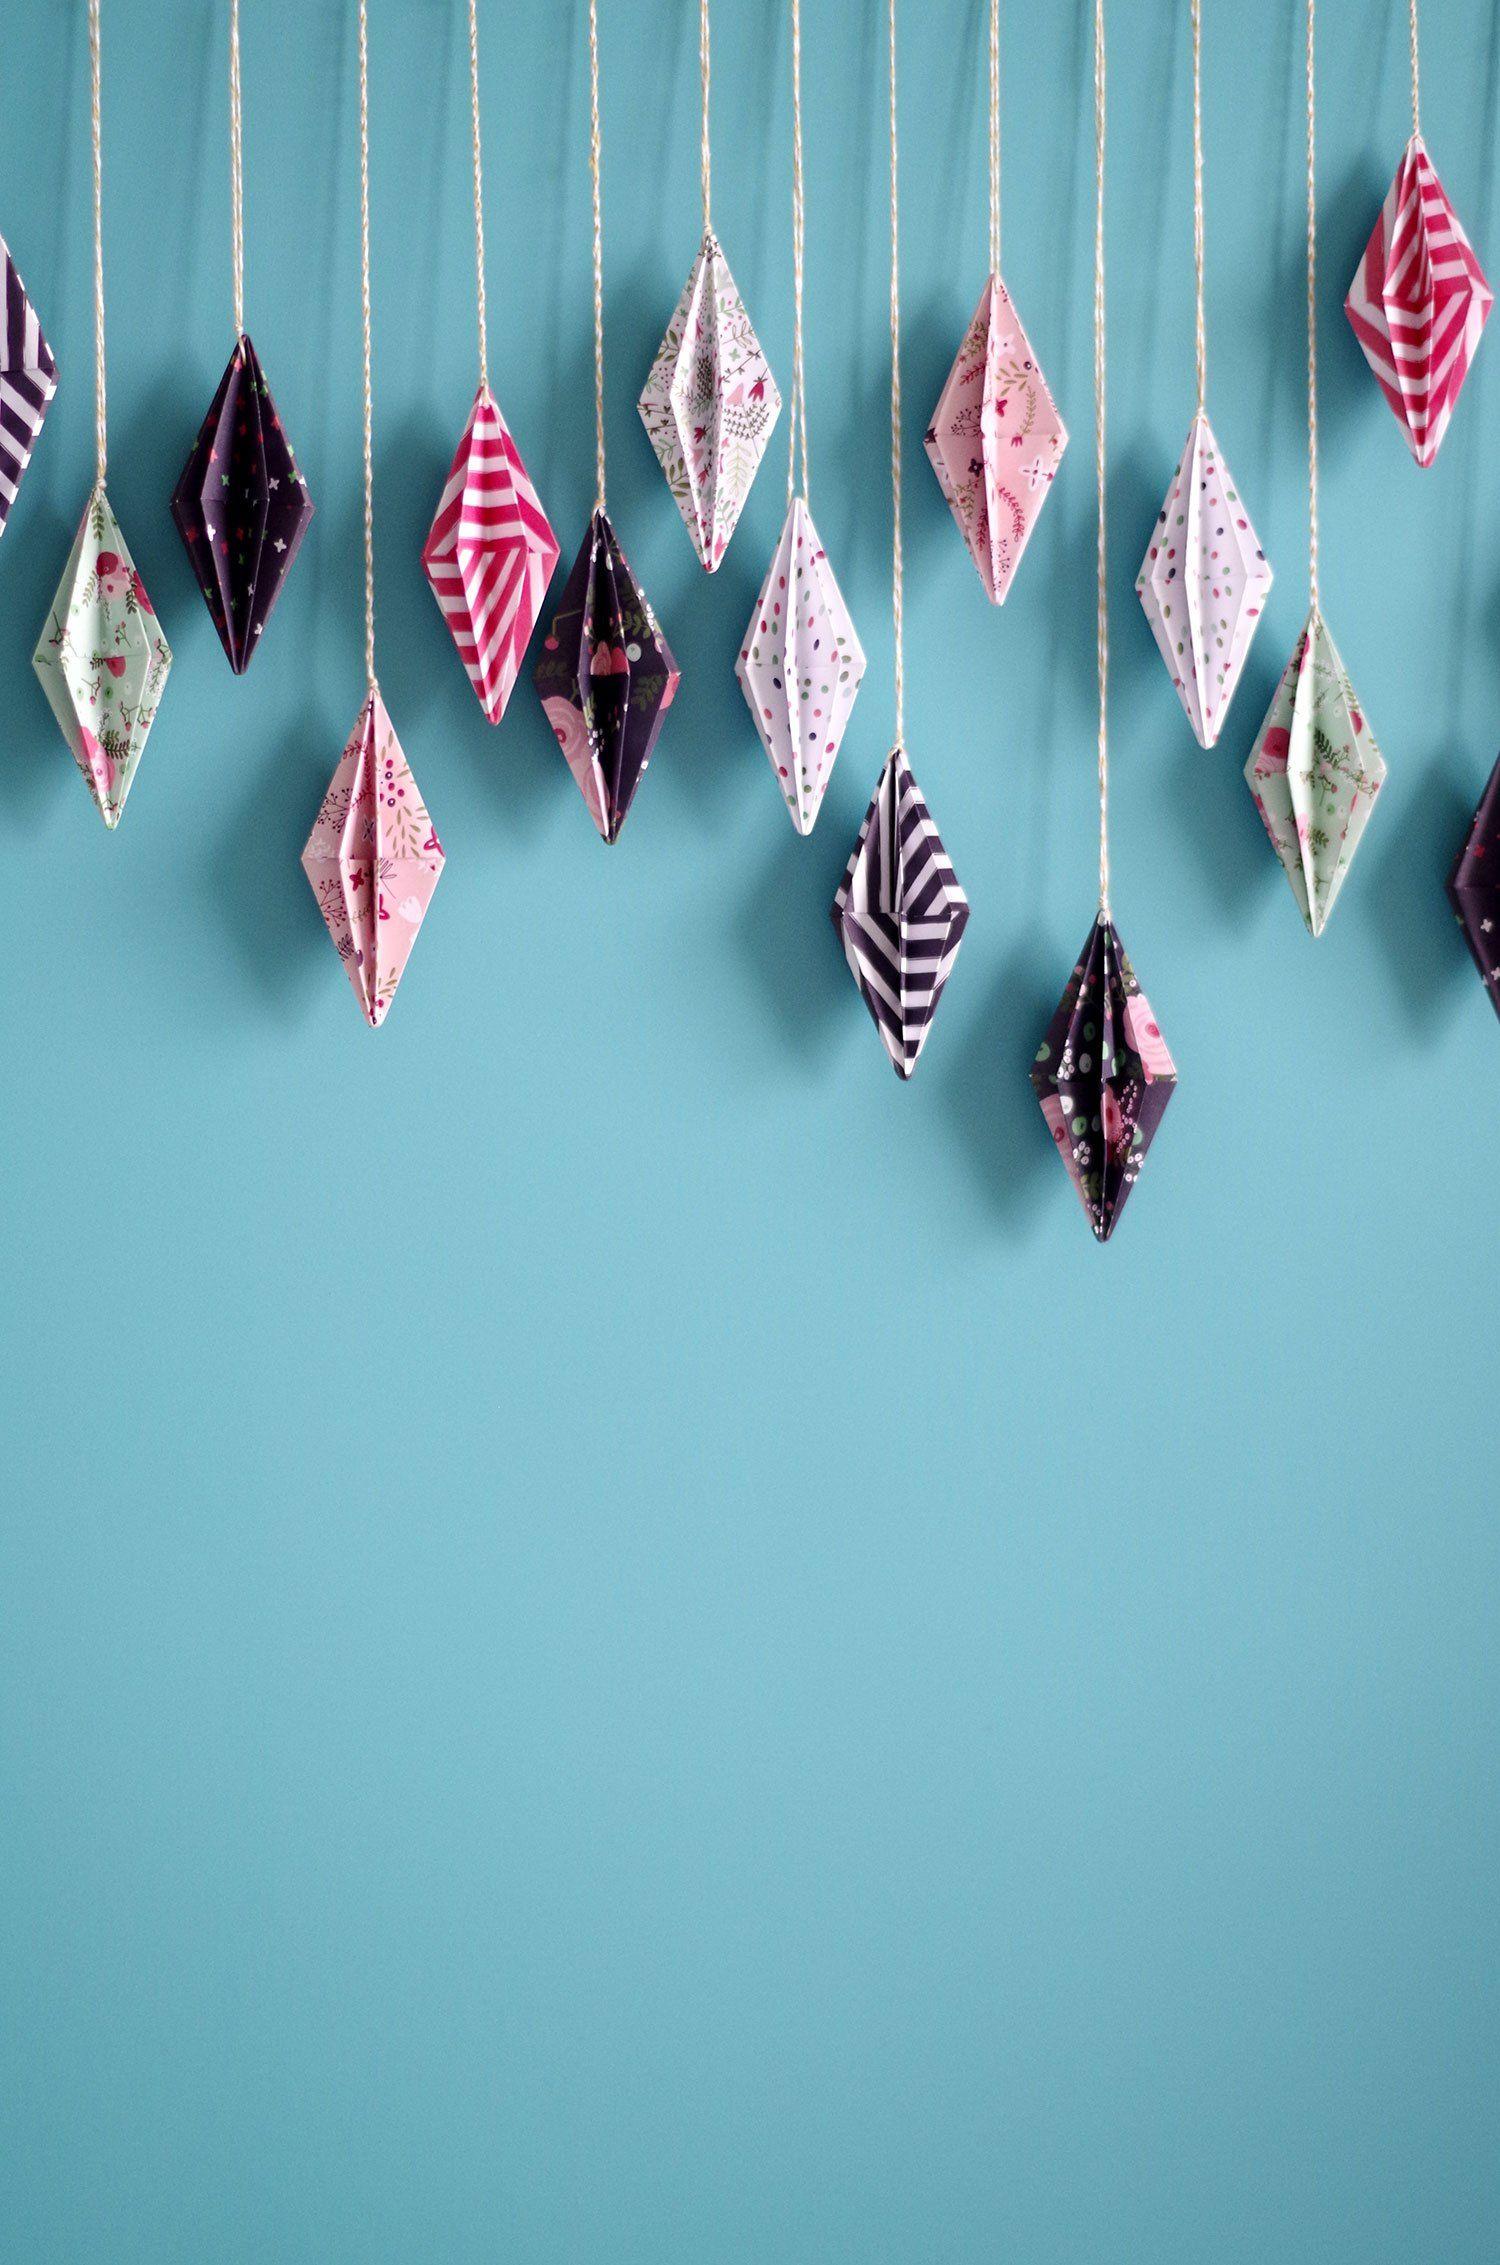 diy ma guirlande de diamant origami d tail kids pinterest origami. Black Bedroom Furniture Sets. Home Design Ideas